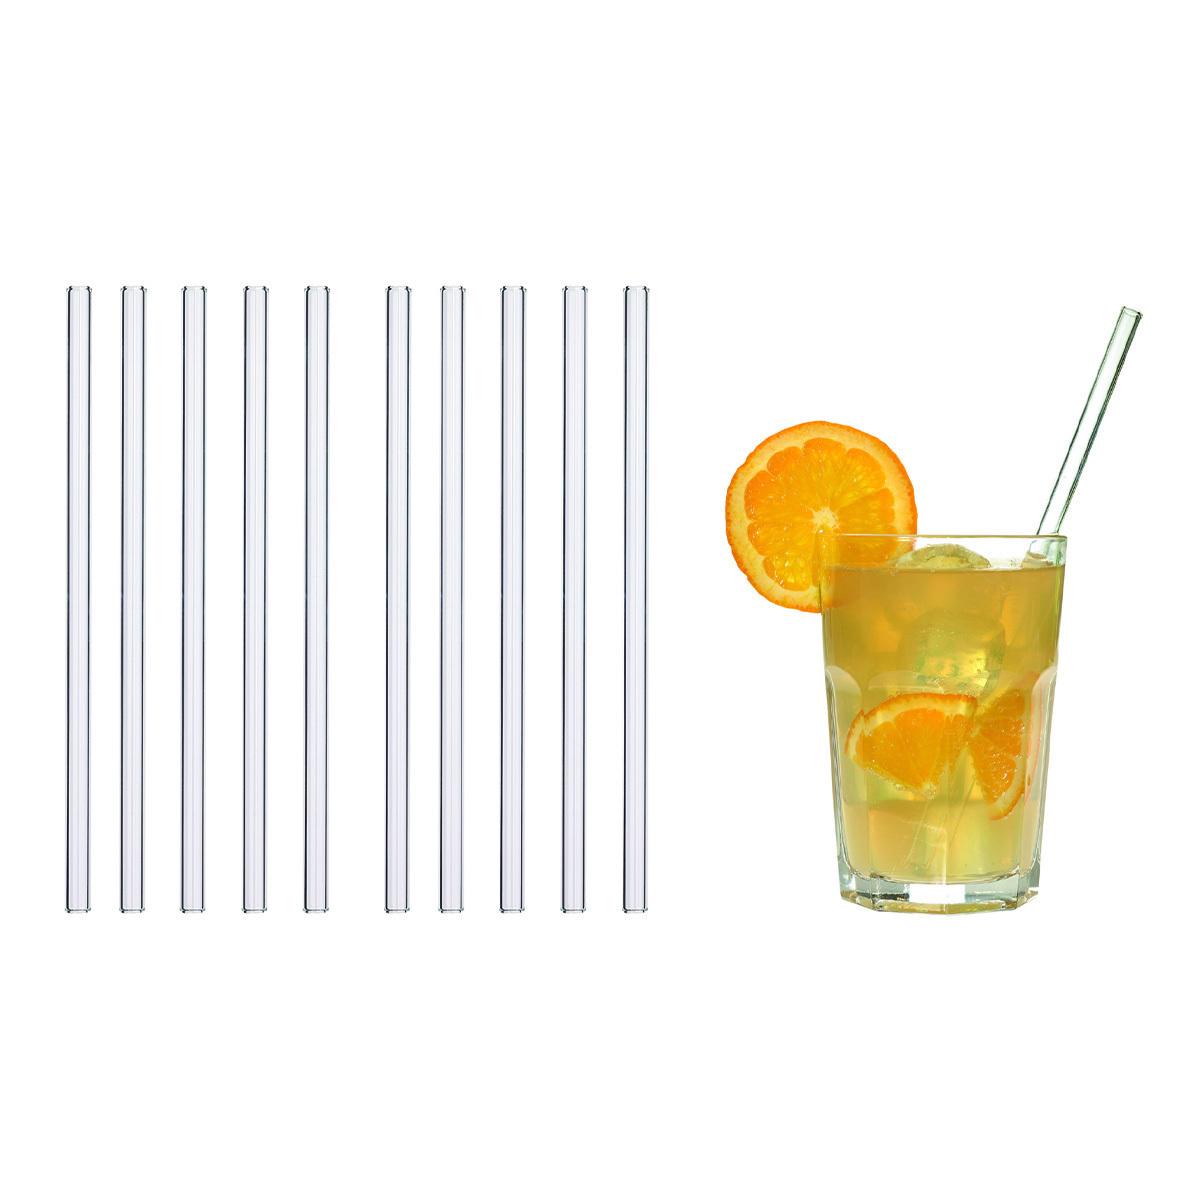 14-2016-10-trinkhalme-aus-glas-glaswerk-medium-set-1200x1200px.jpg